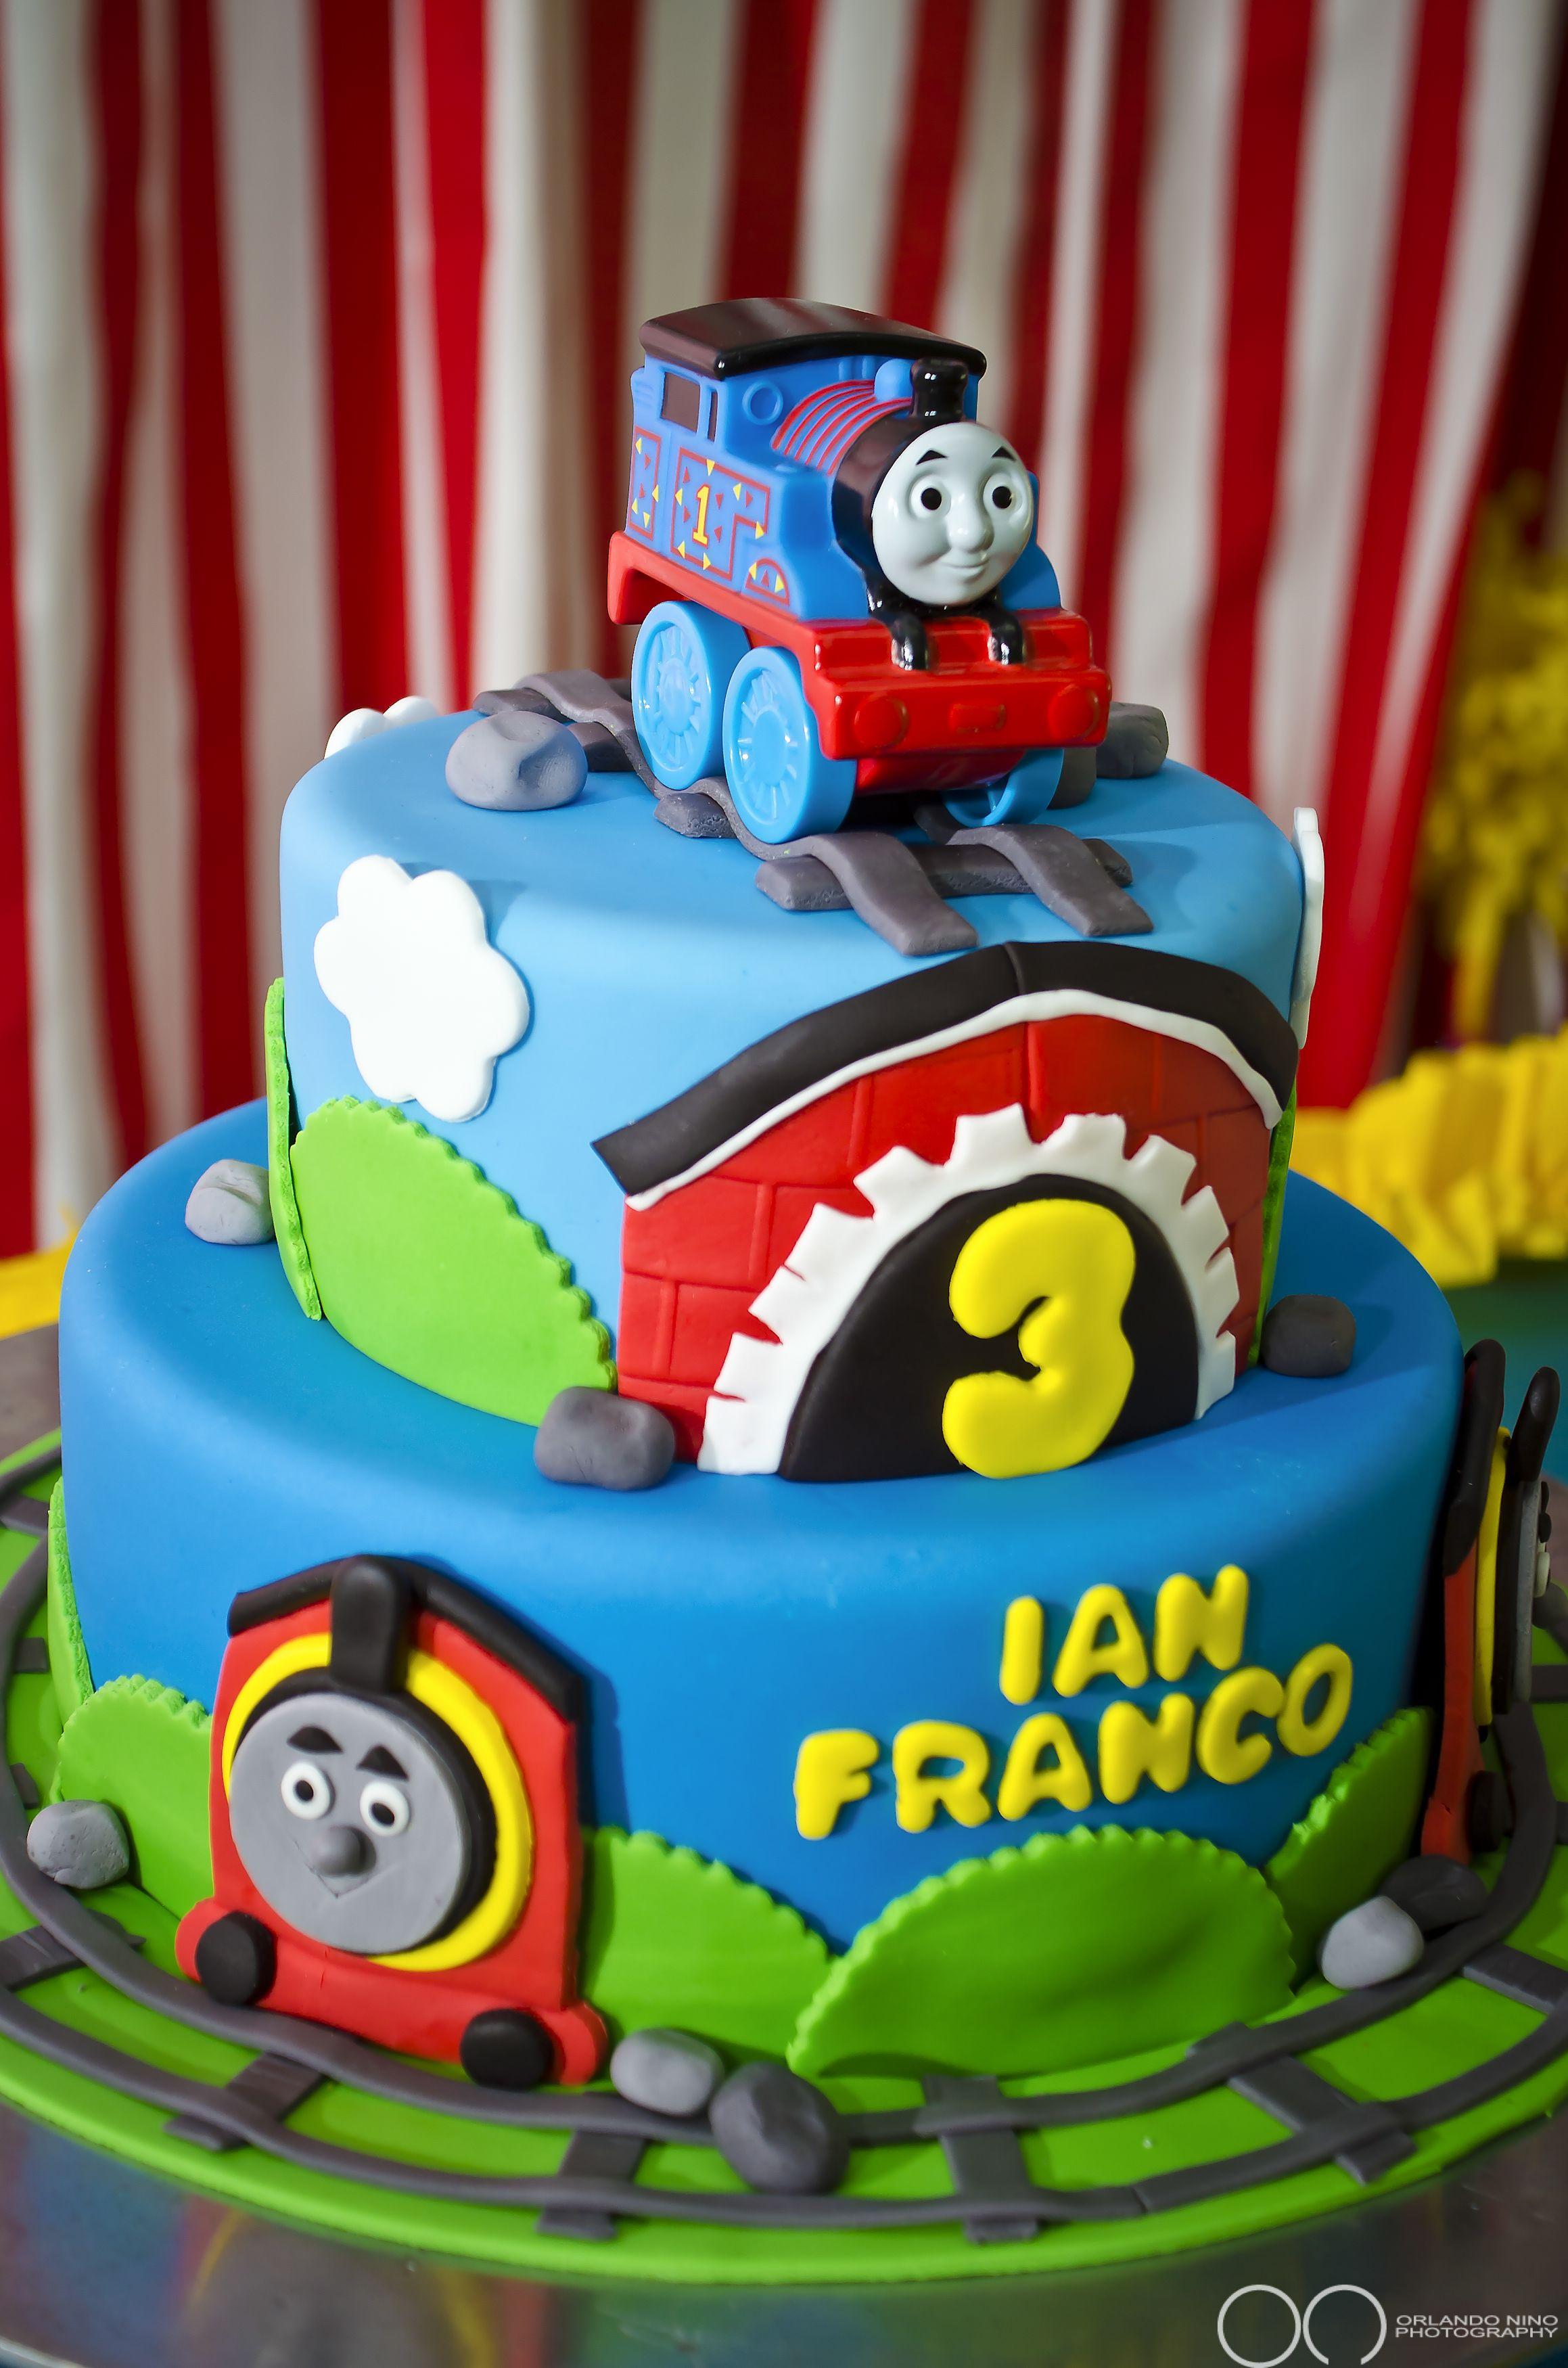 Thomas And Friends Birthday Cake Camdens Rd Birthday Pinterest - Thomas birthday cake images